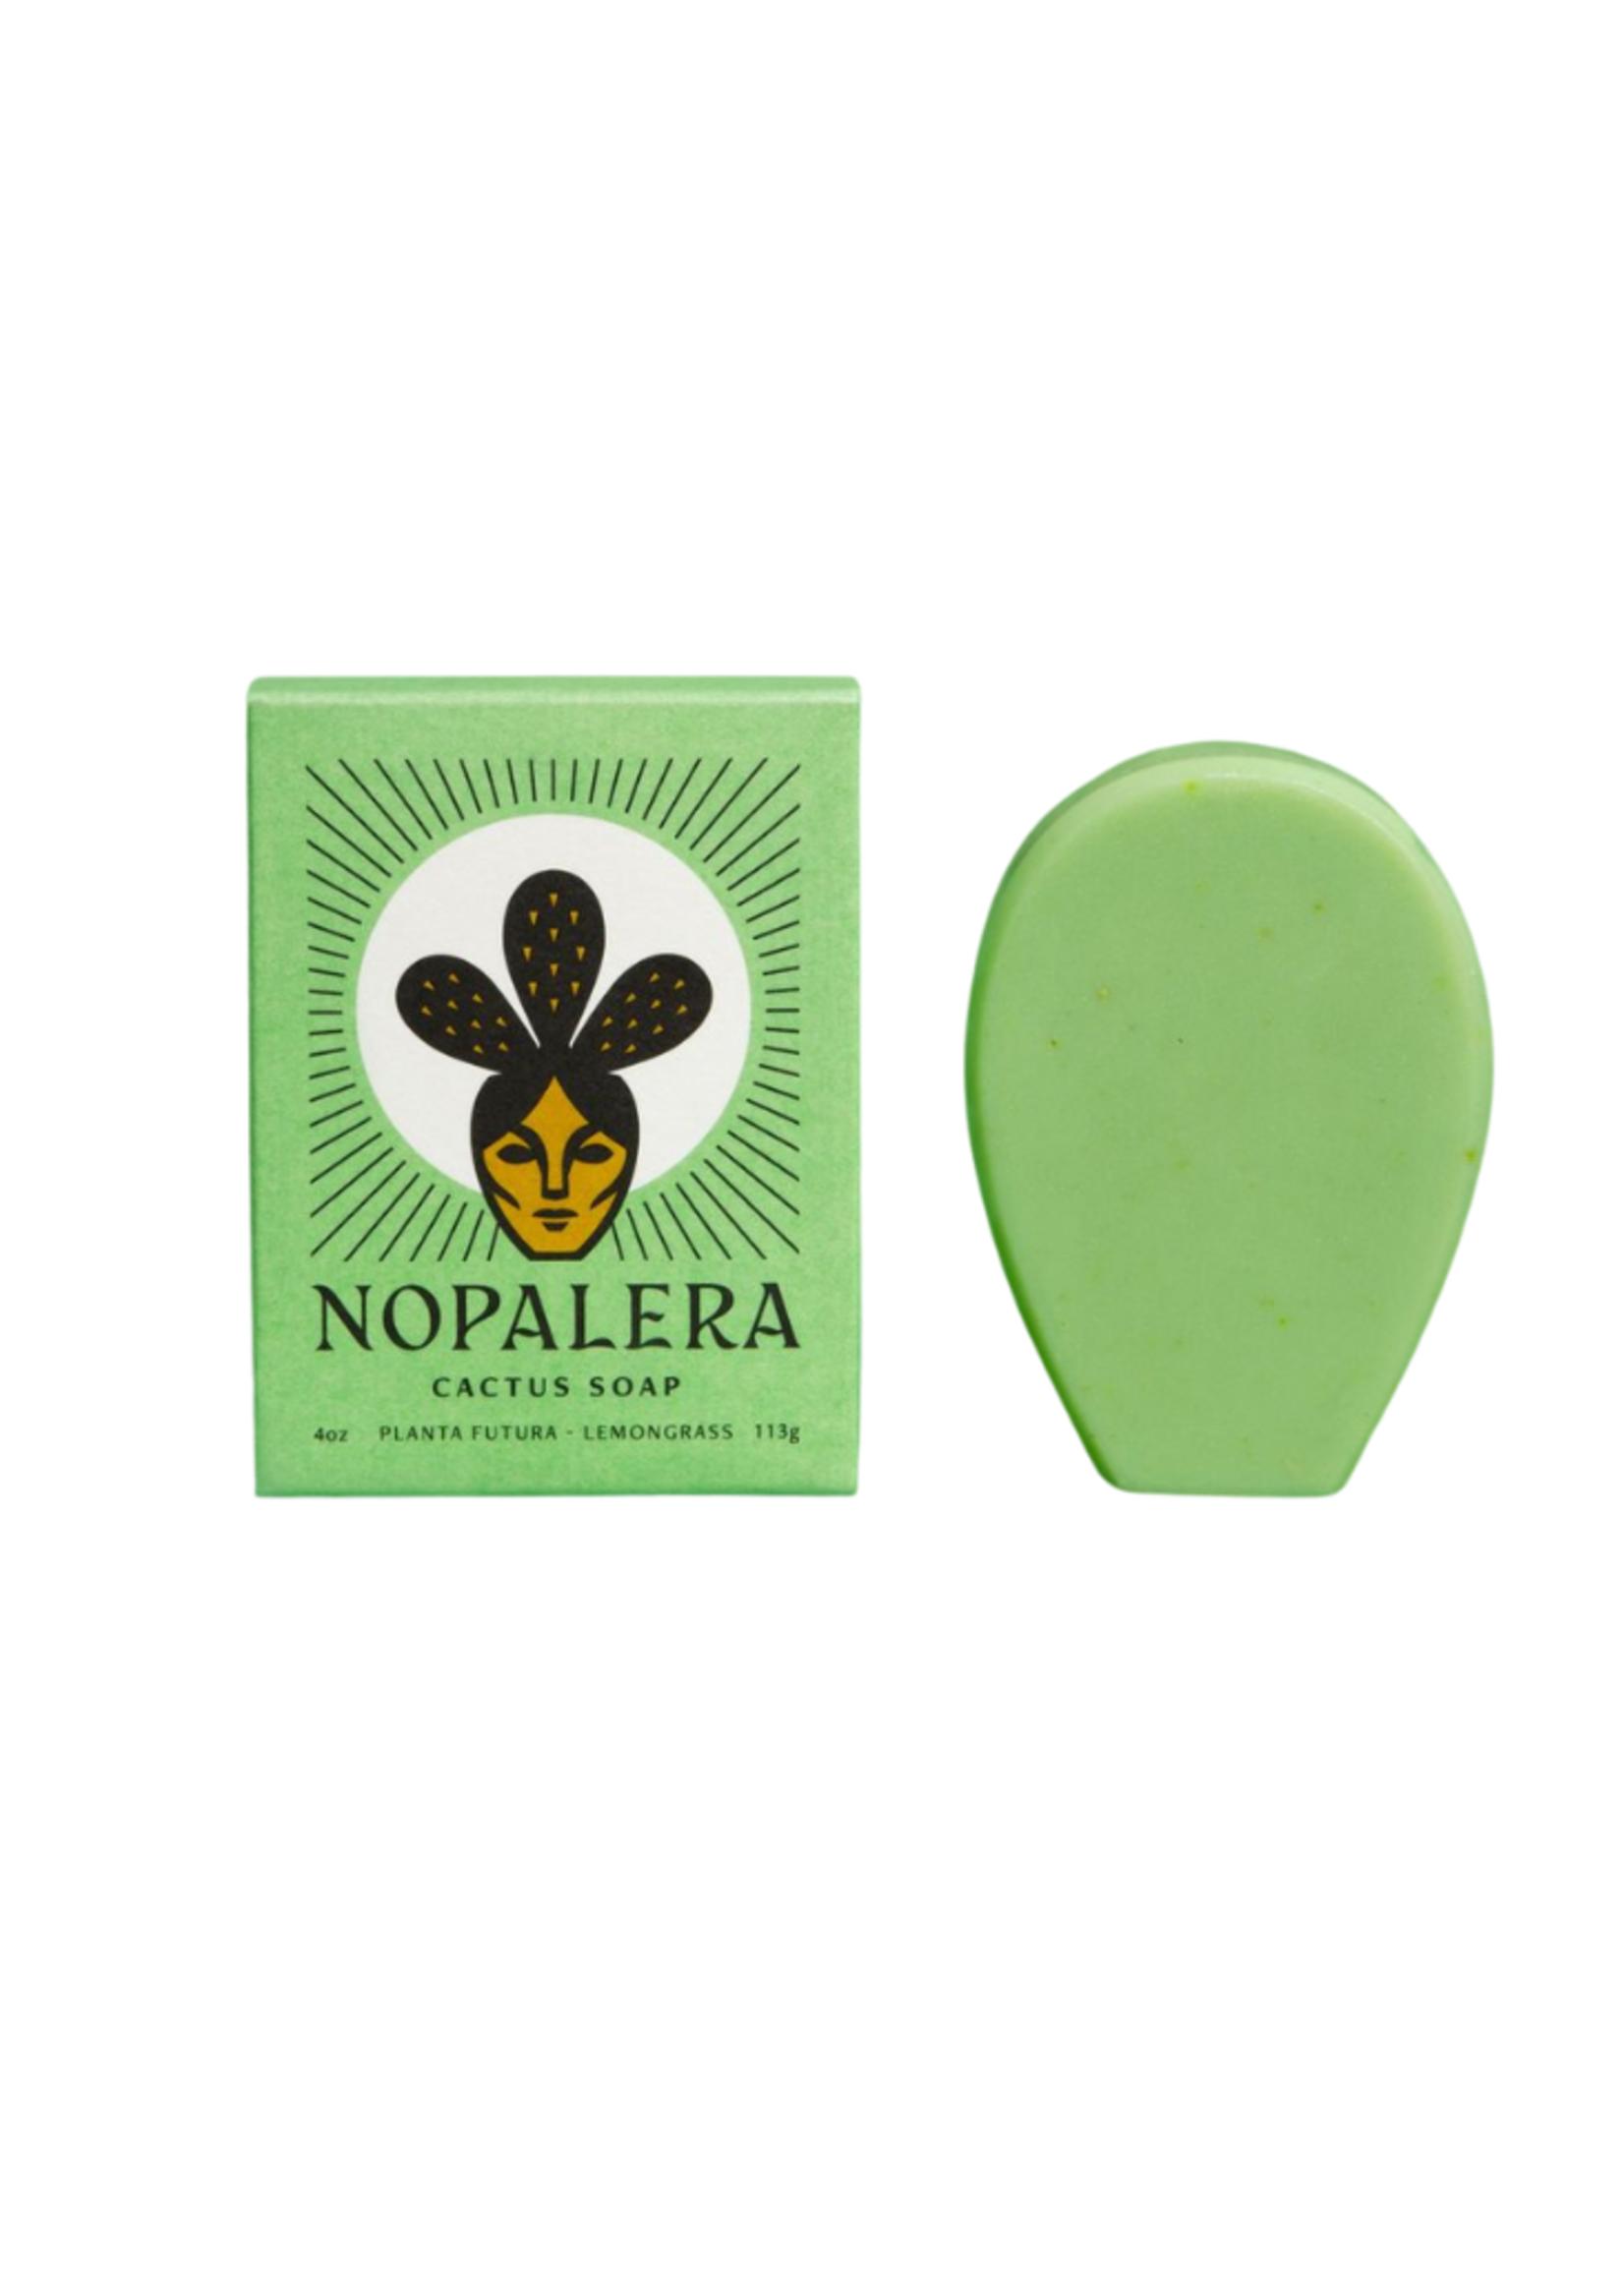 Nopalera Planta Futura Cactus Soap